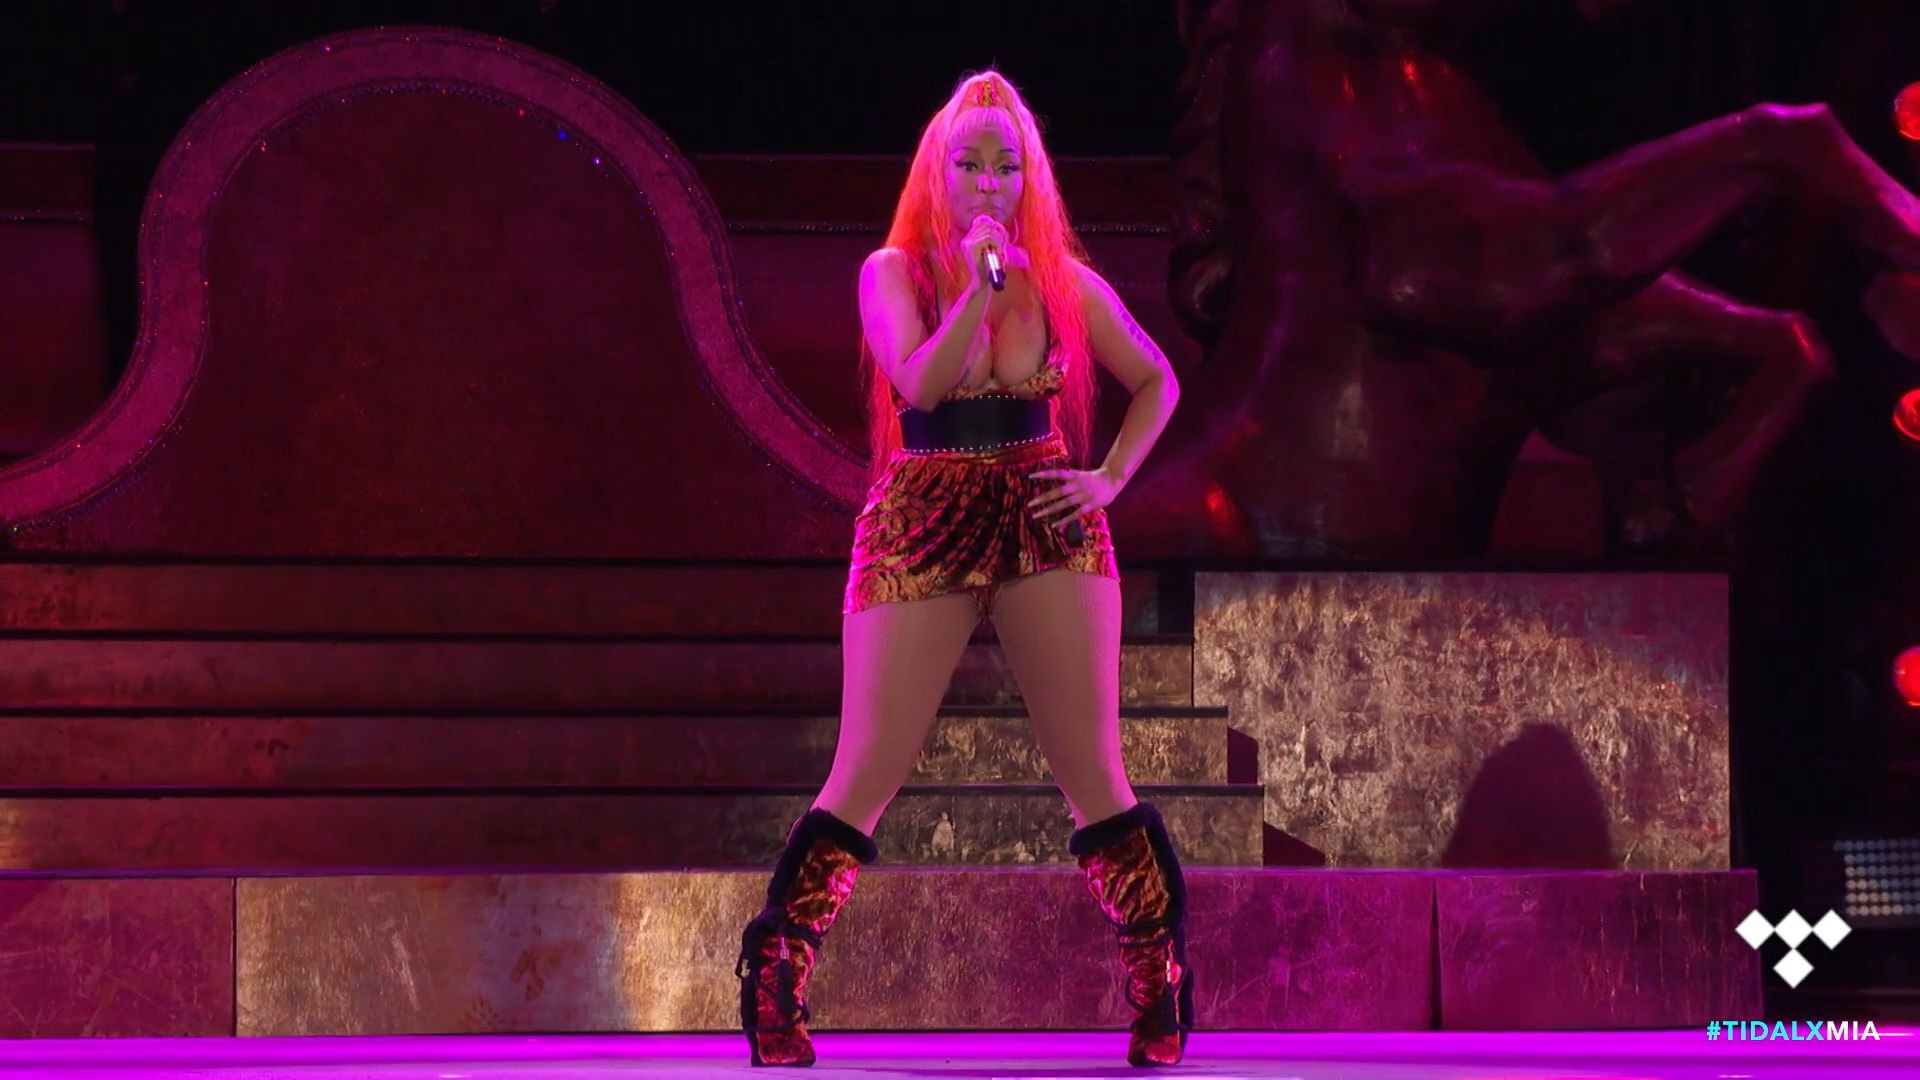 Nicki-Minaj-Nude-TheFappeningBlog.com-17.jpg